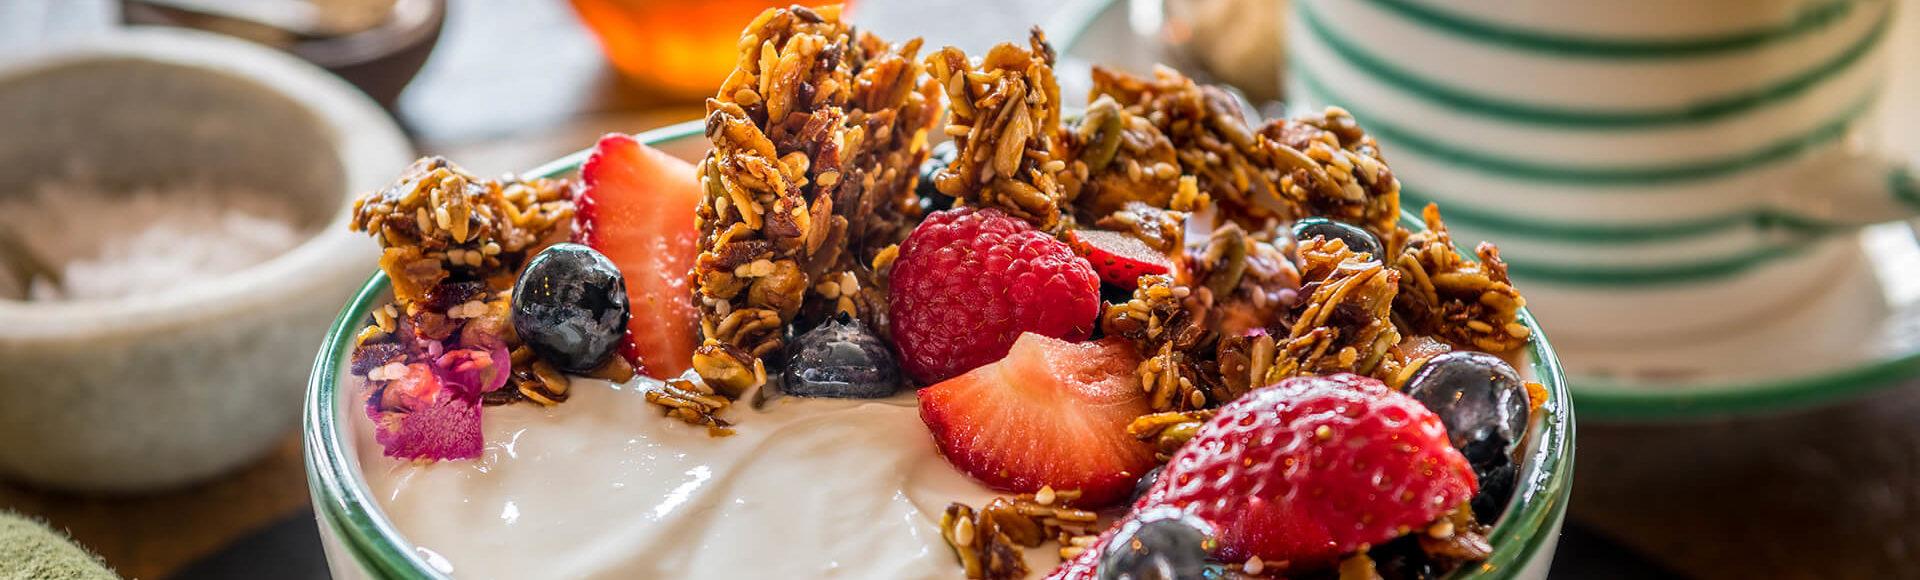 Fresh yogurt and granola served at breakfast